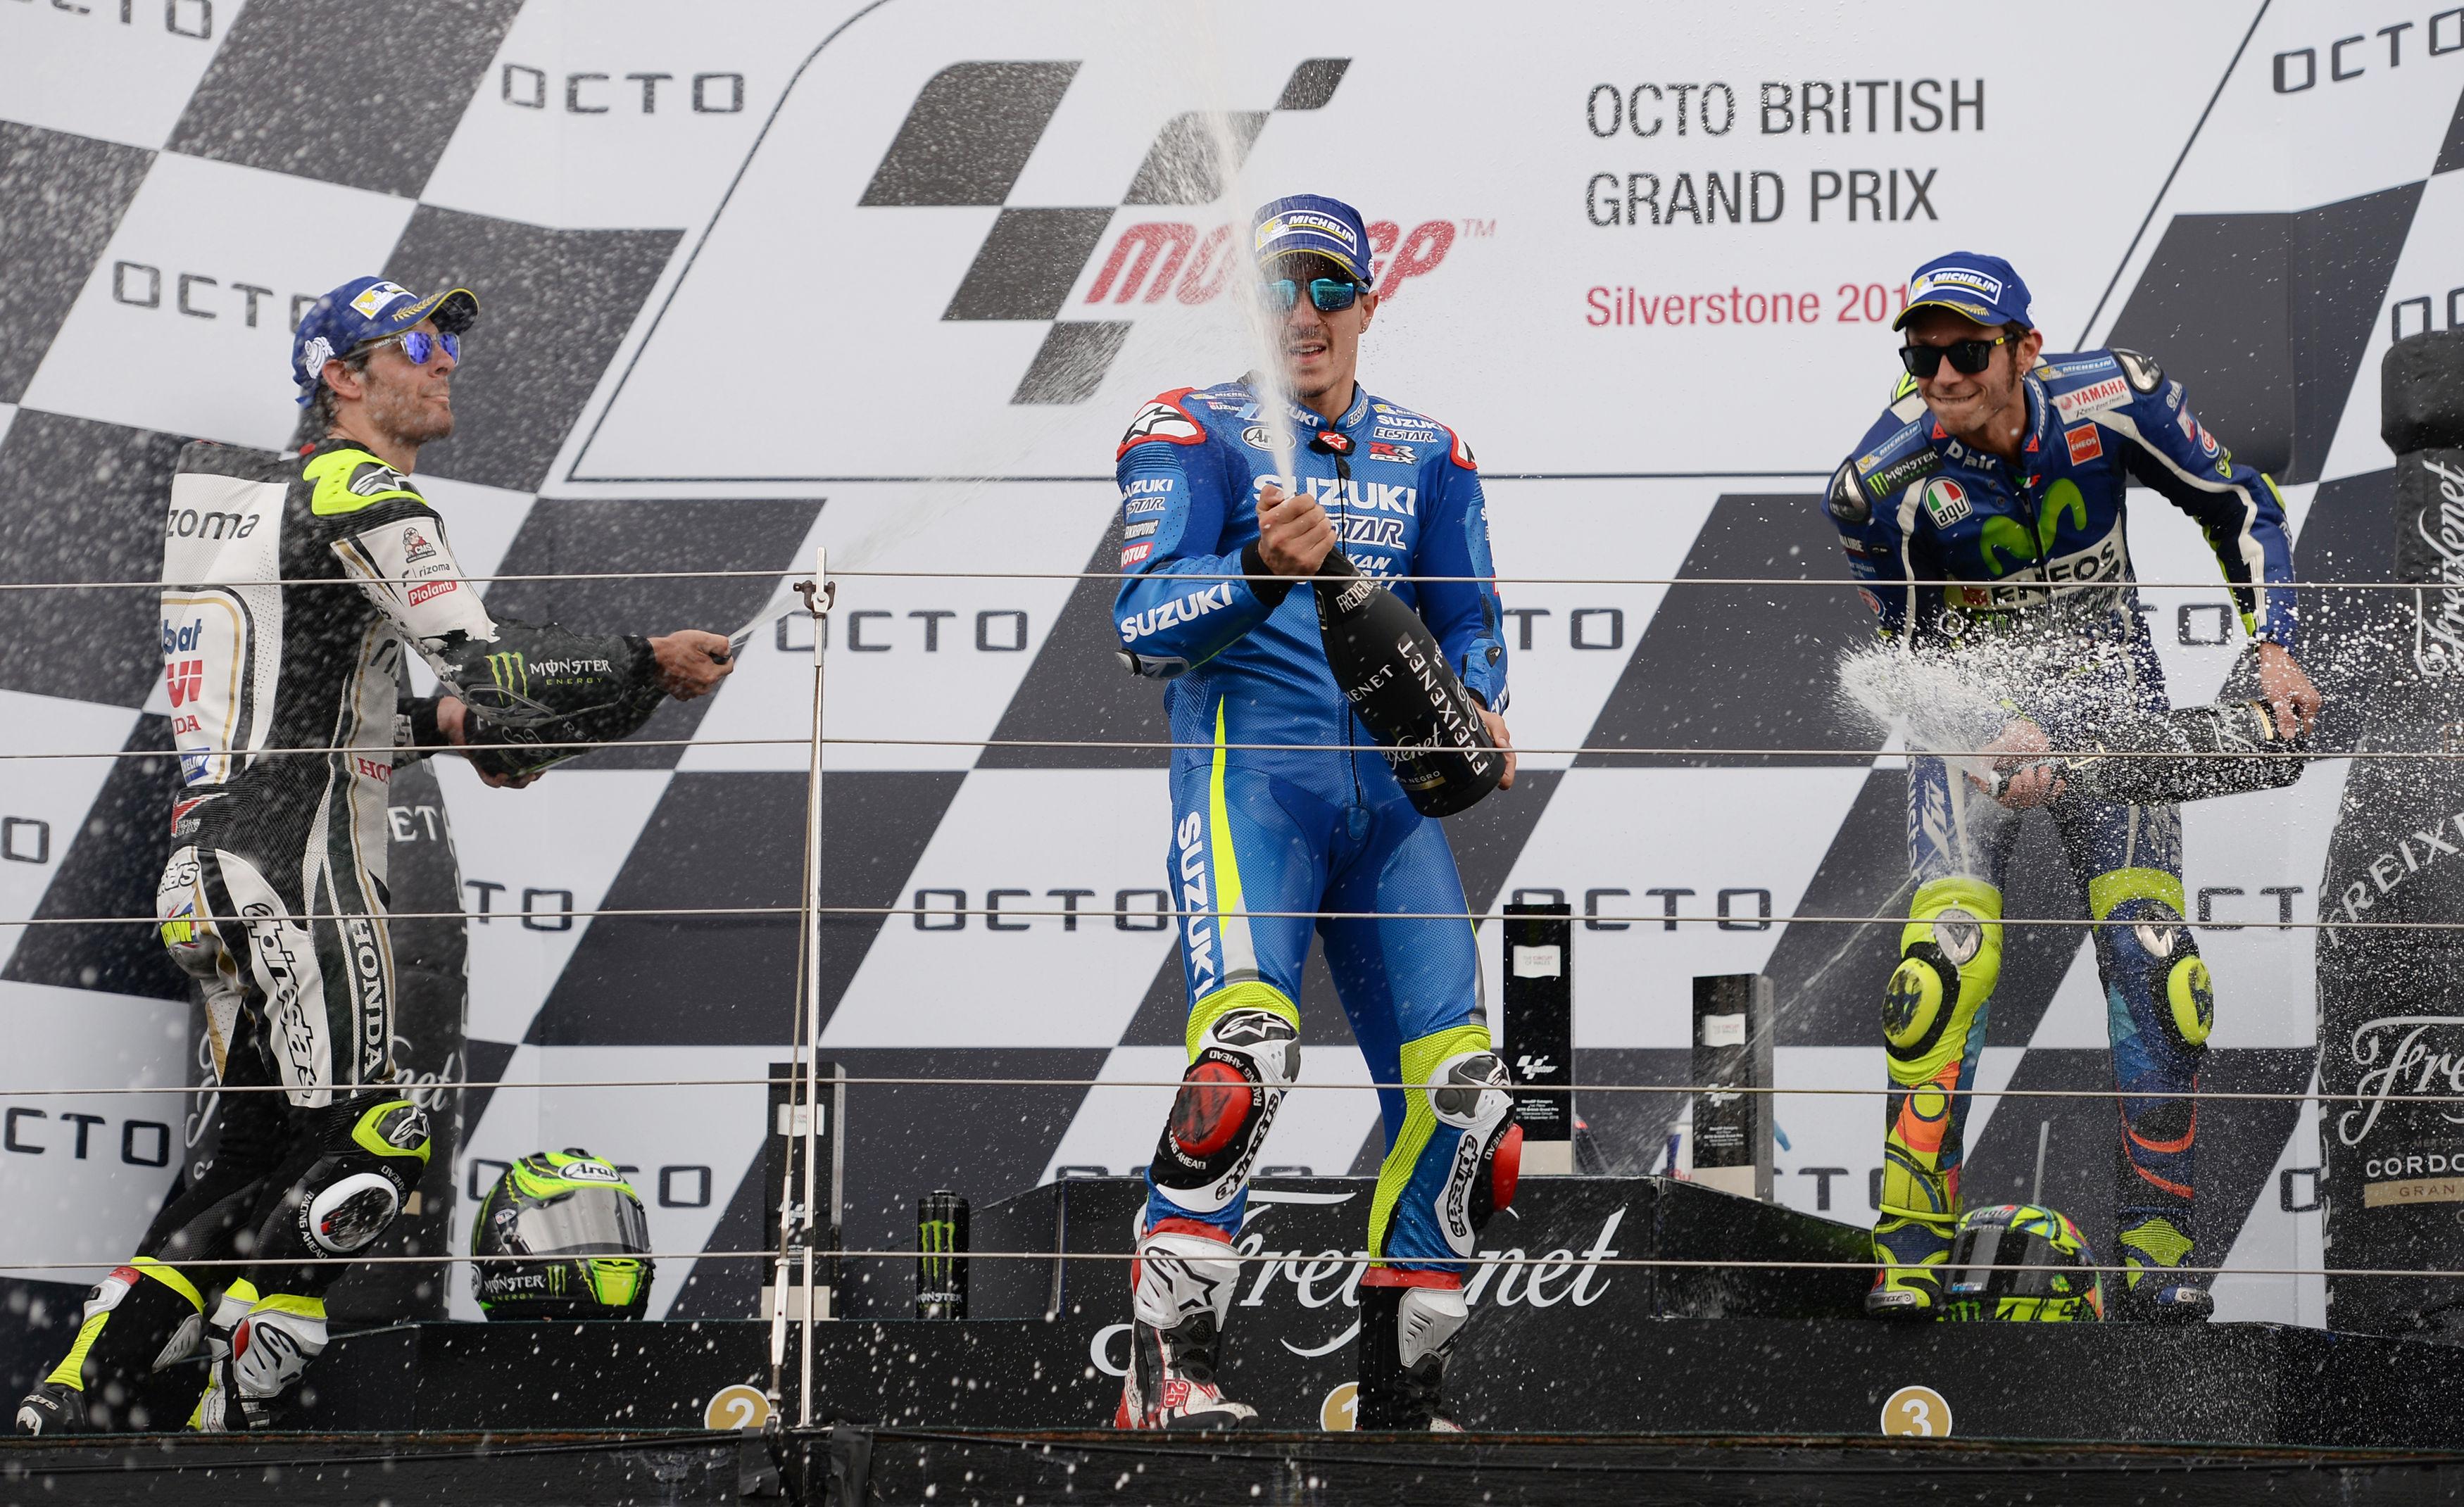 MotoGp, trionfa Vinales. Rossi terzo, cade Iannone